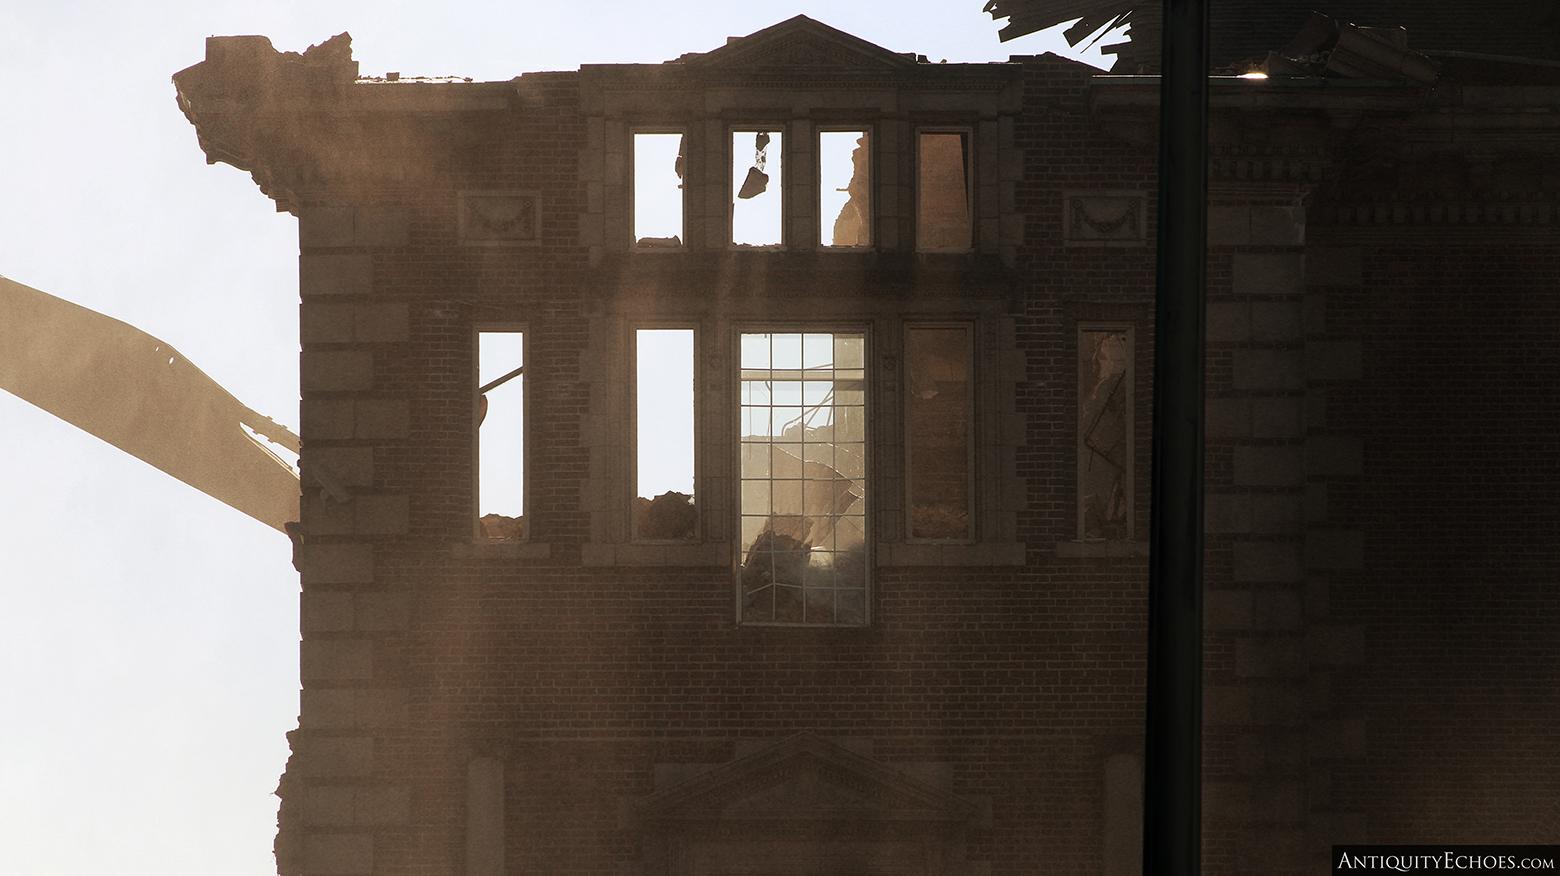 Allentown State Hospital - Demolition - Farewell